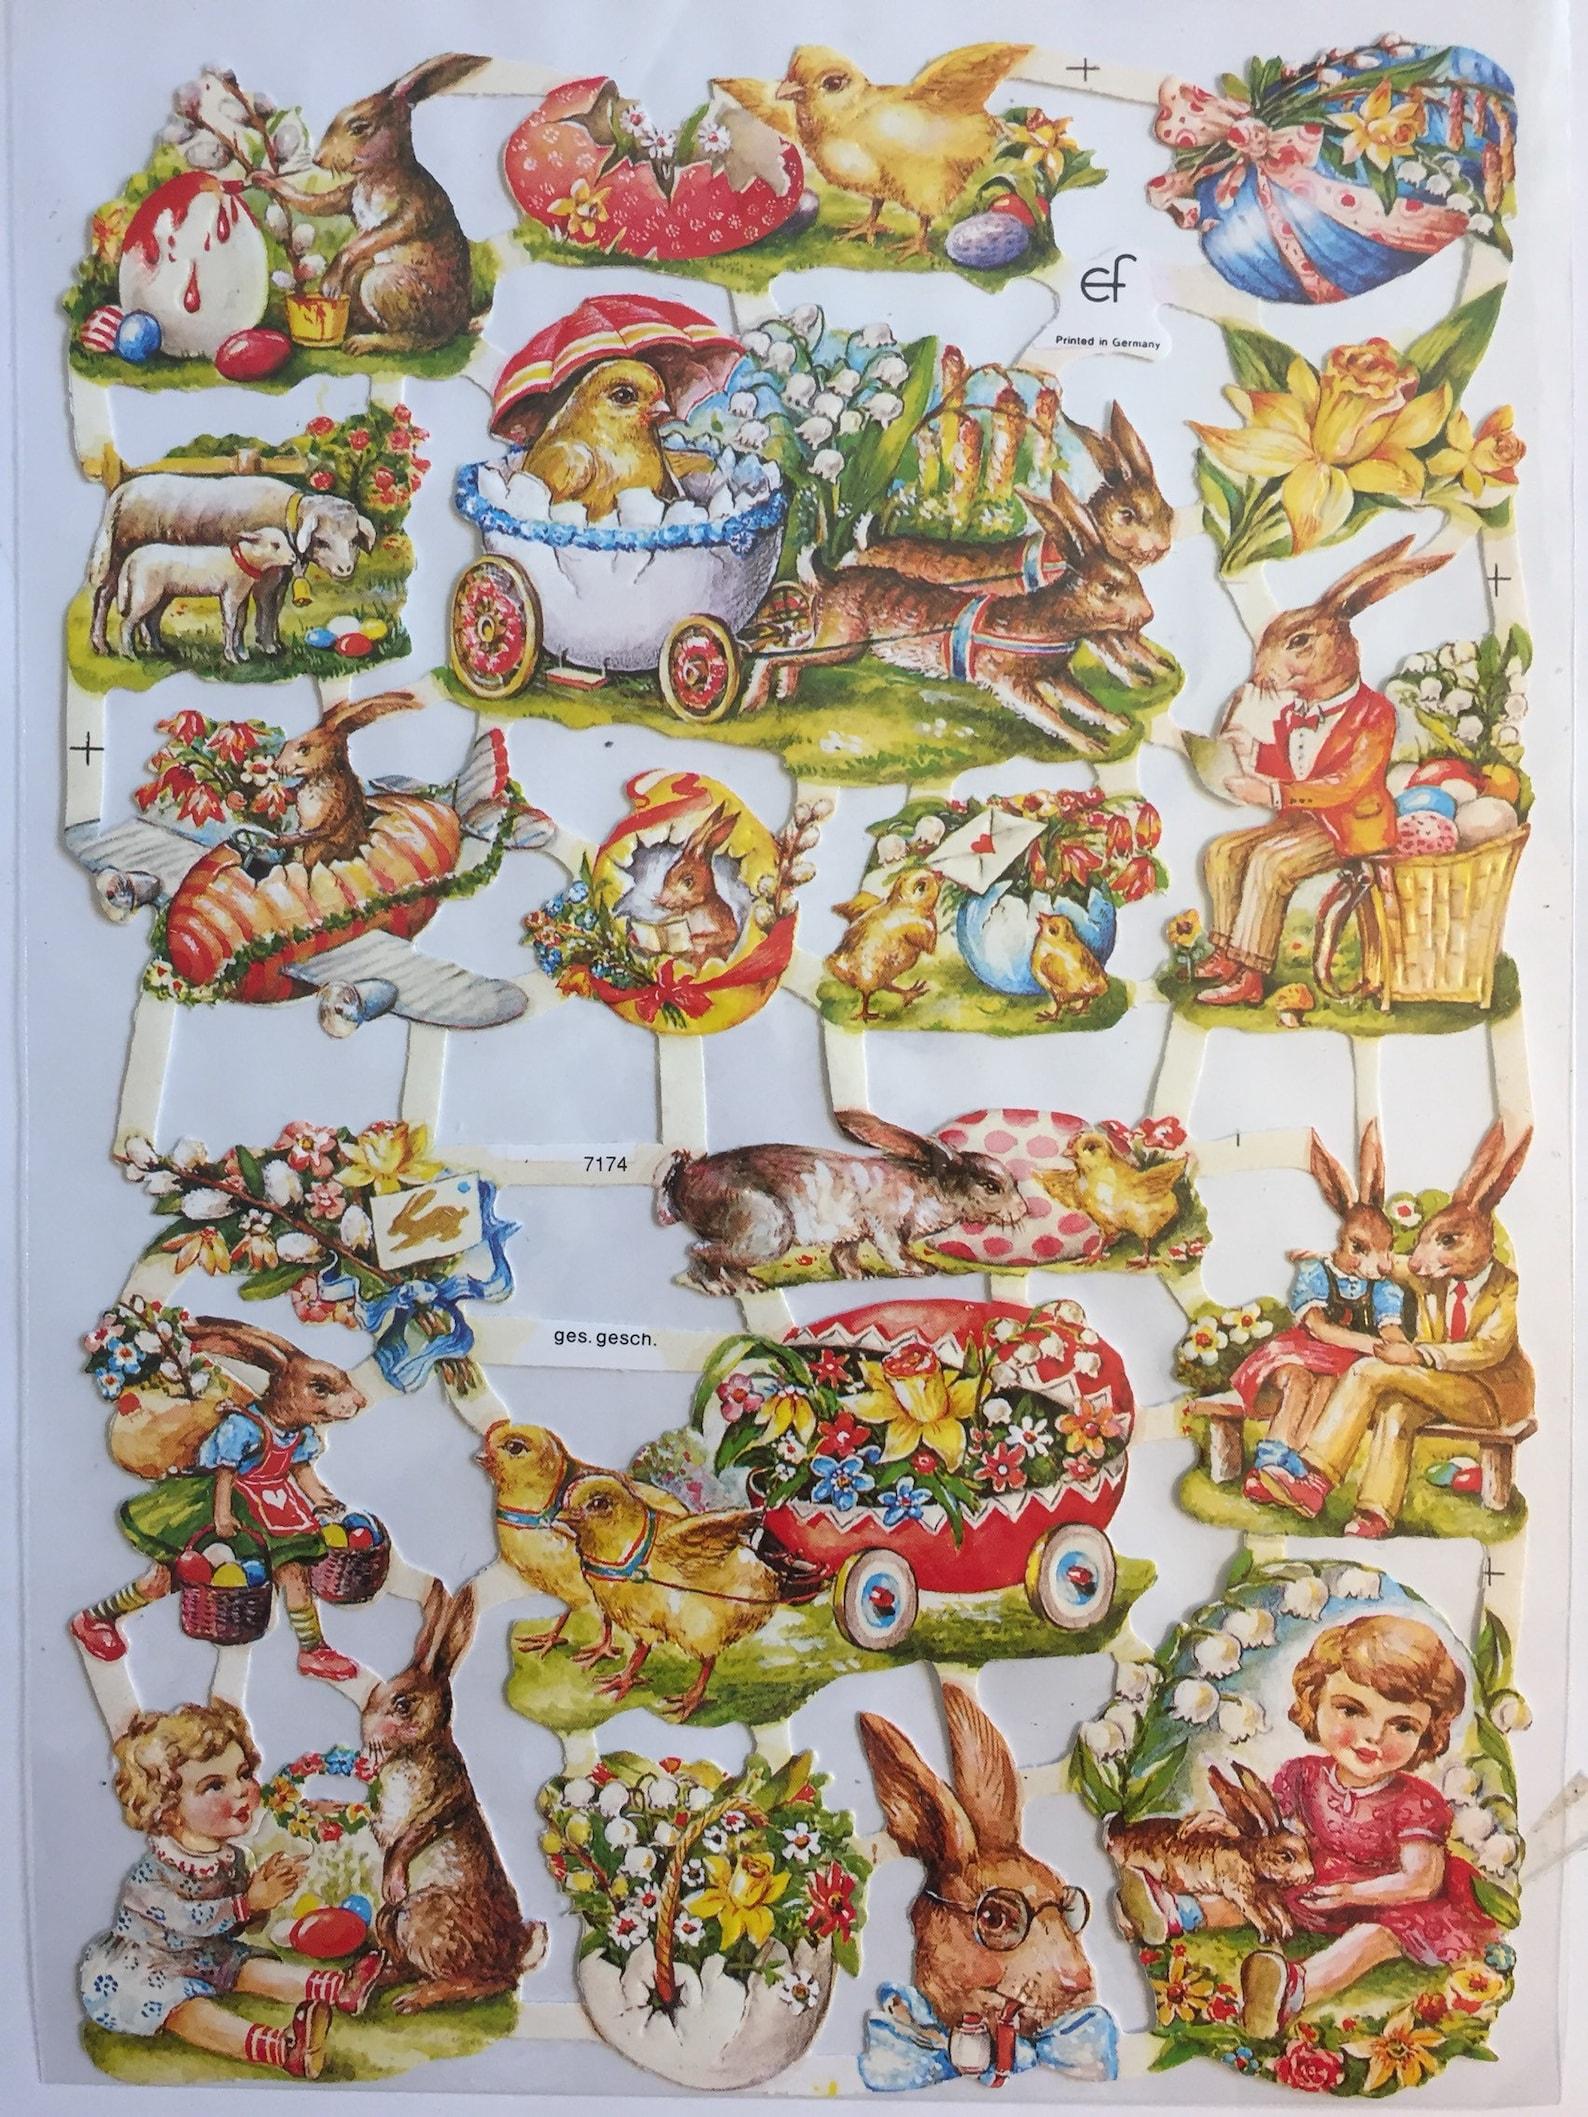 Vintage Easter Rabbits Chicks Children Glanzbilder (1 sheet) #7174 Embossed Die Cuts - Ernst Freihoff GmbH Made in Germany